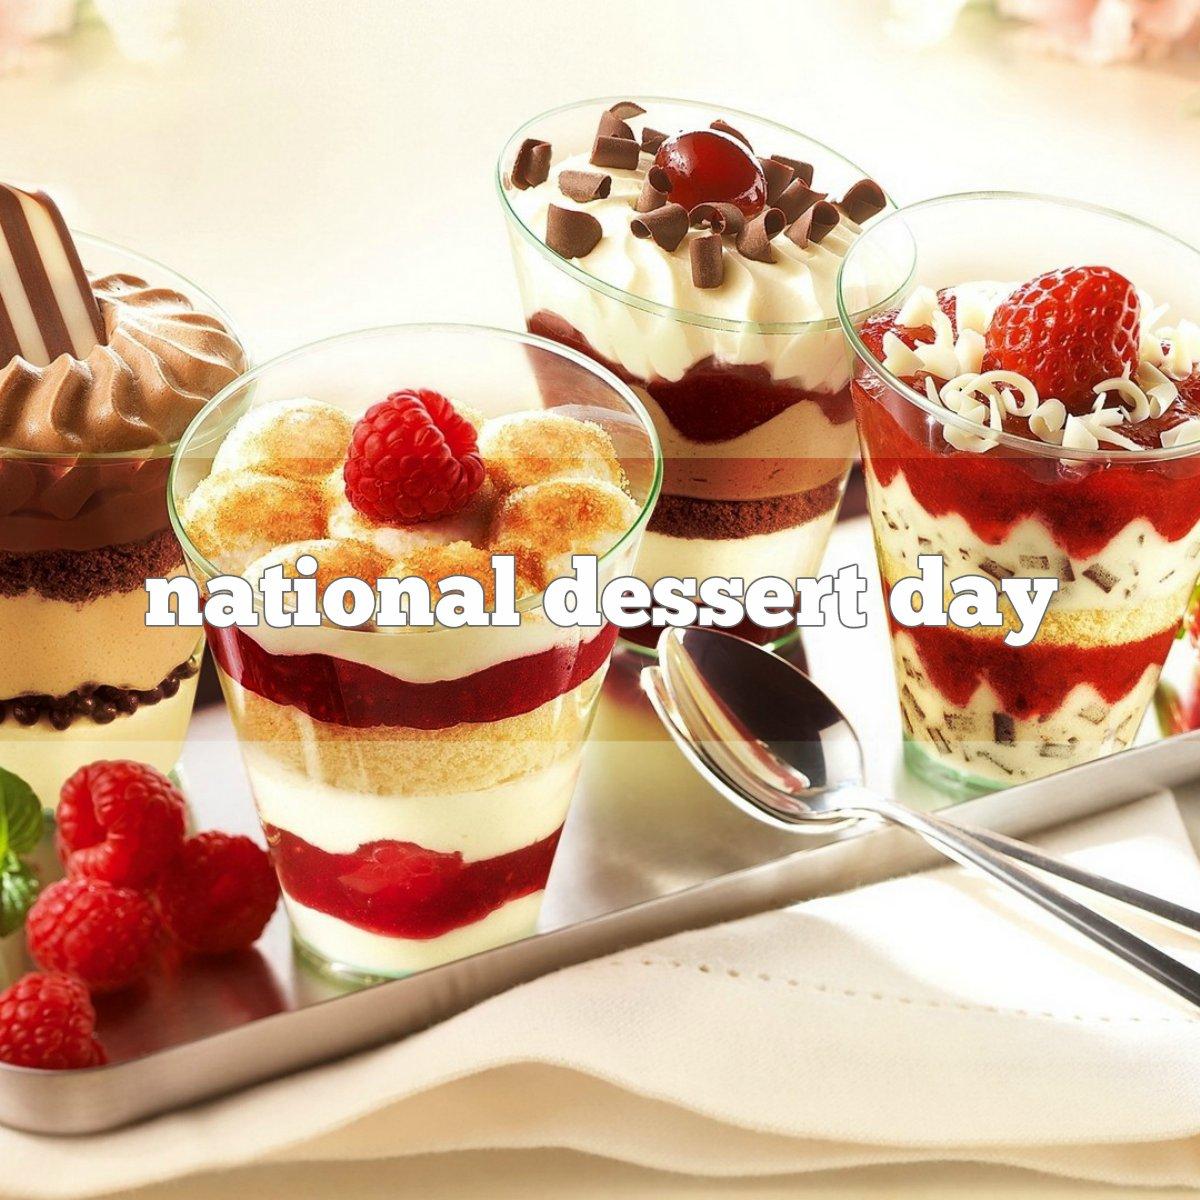 October 9 Is National Dessert Day